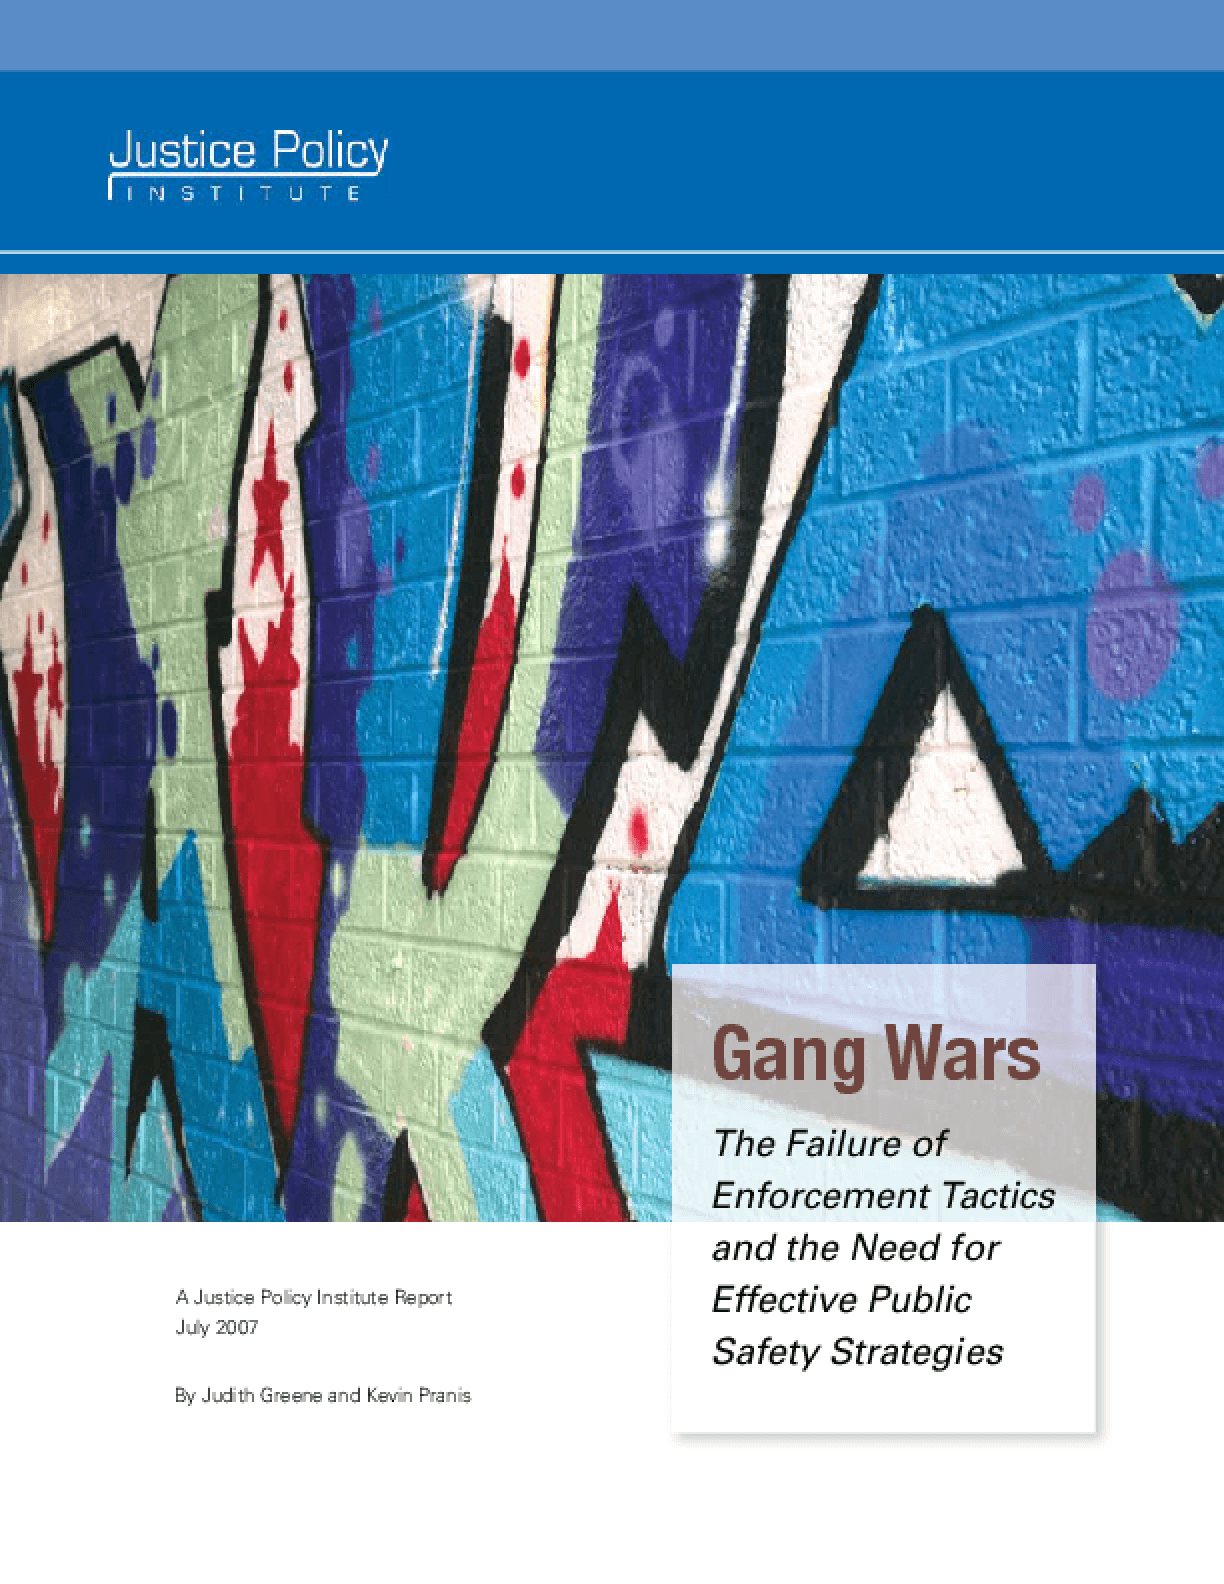 Gang Wars: The Failure of Enforcement Tactics